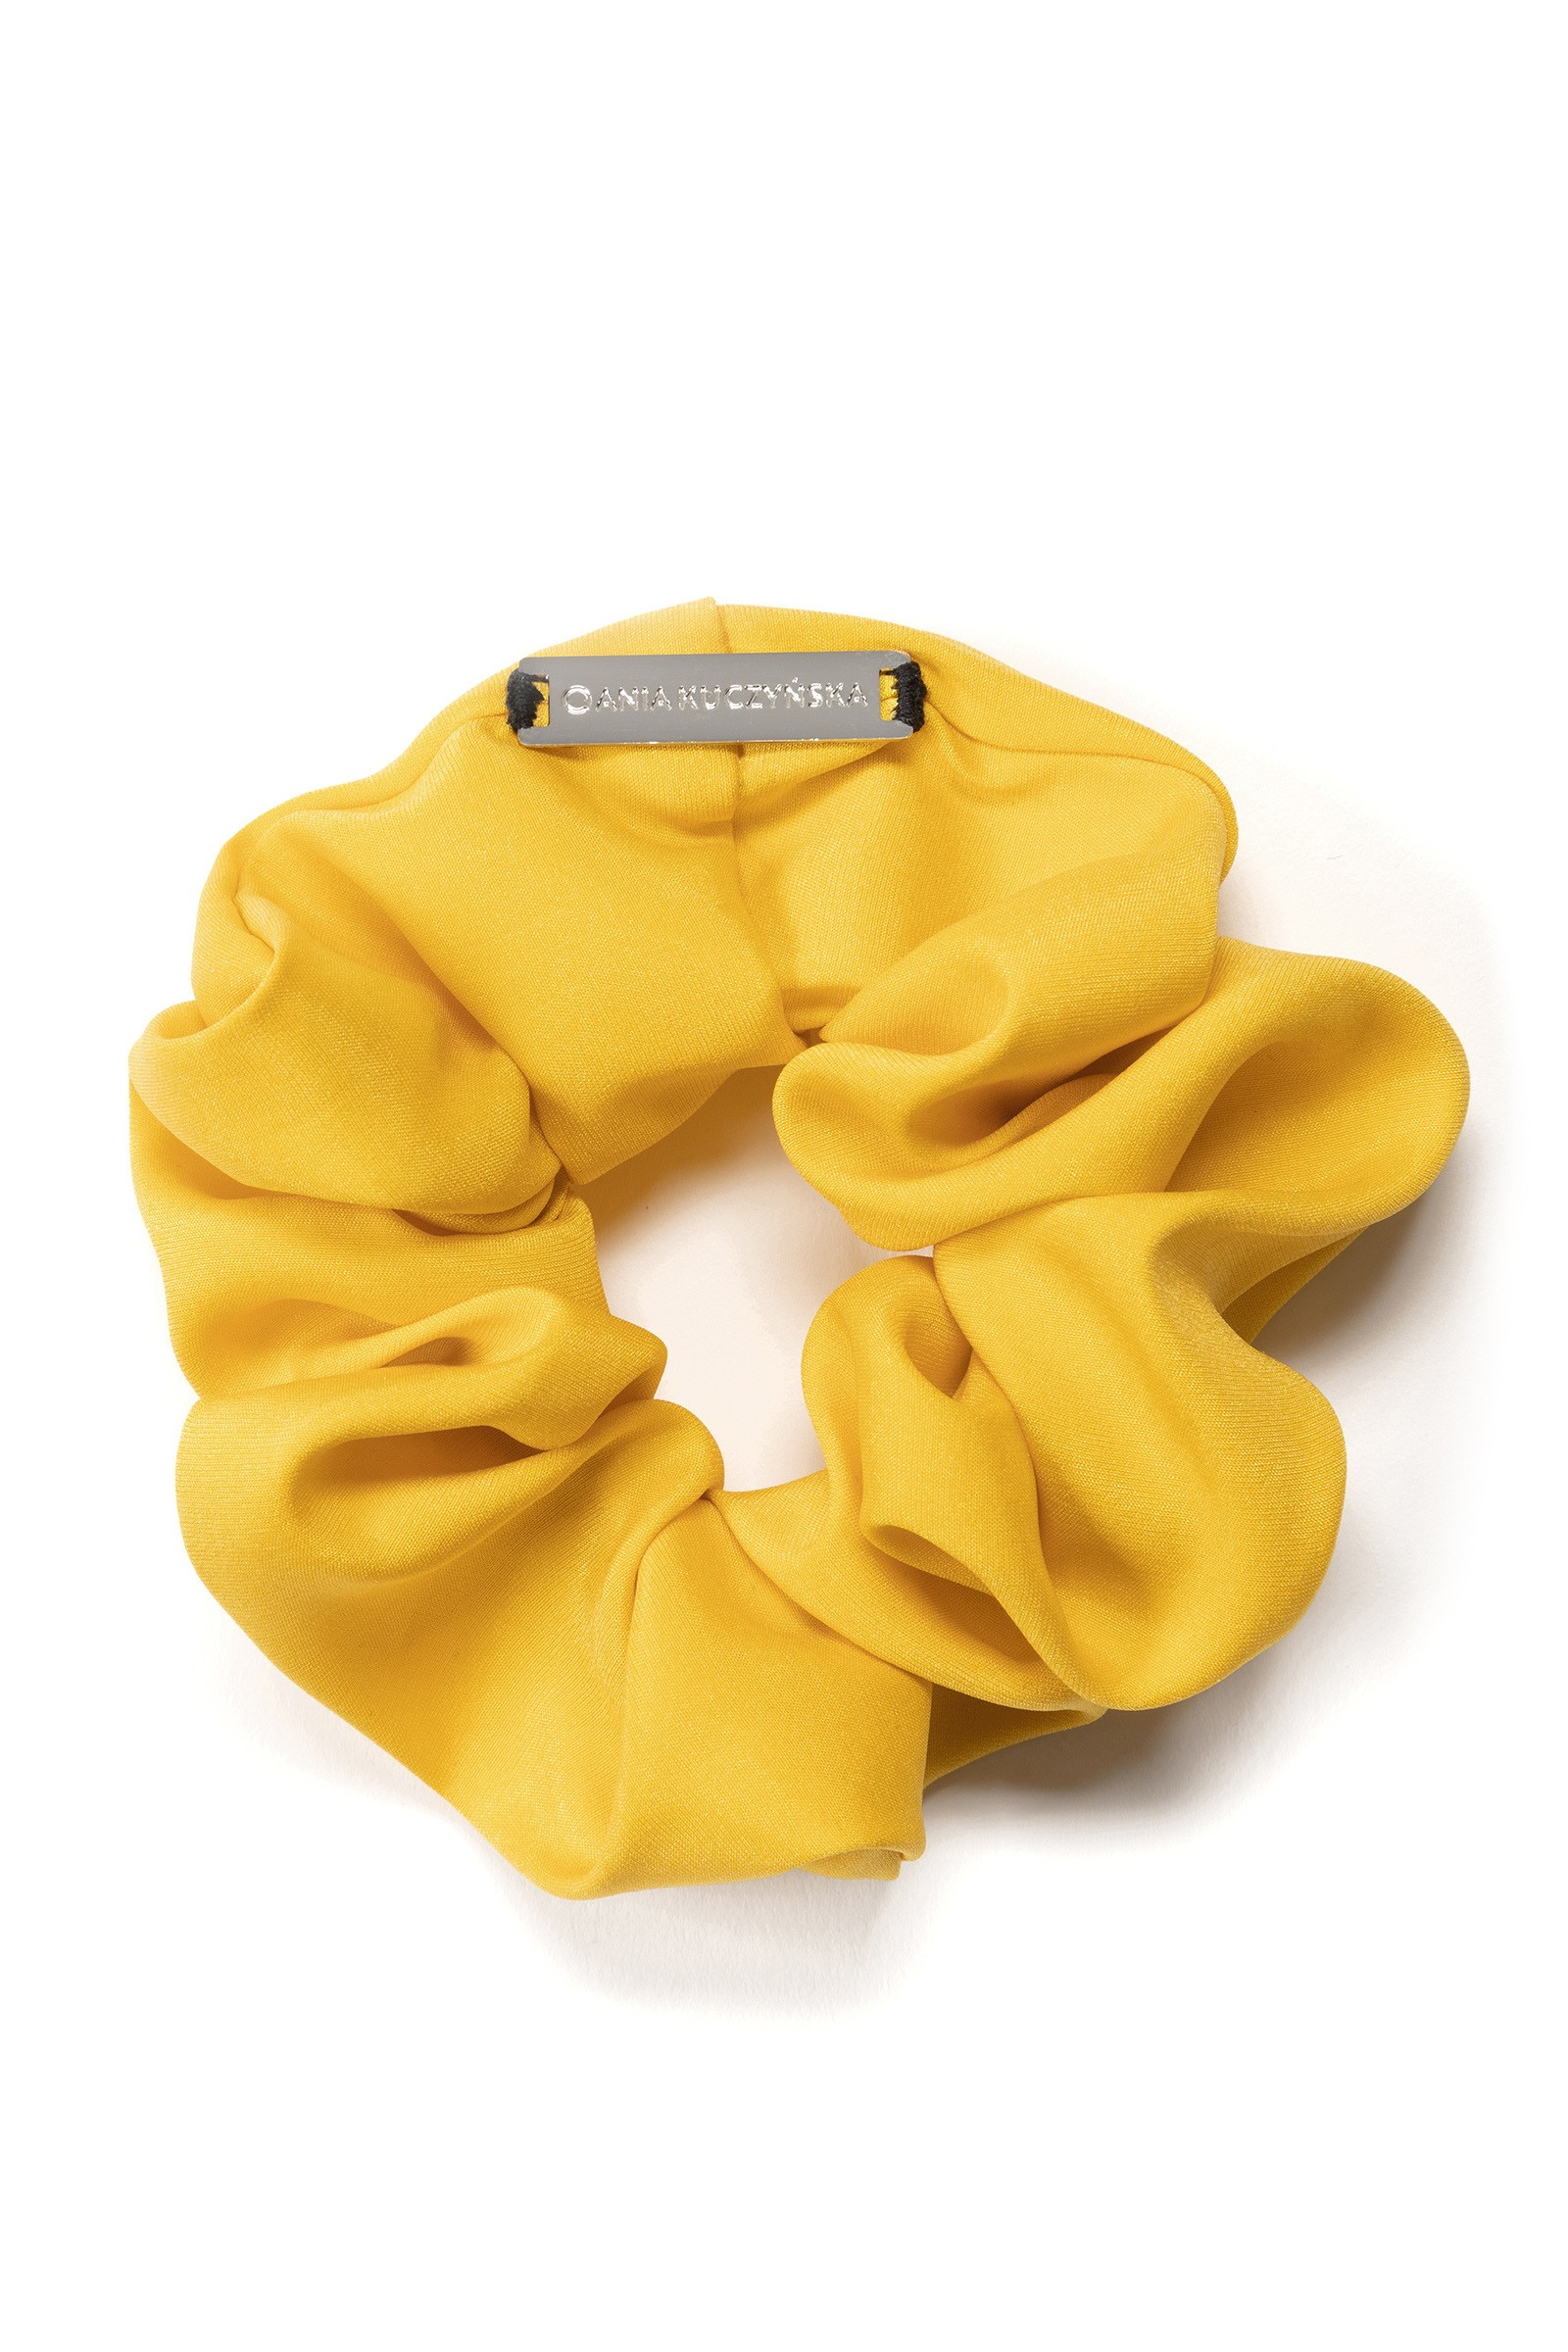 LOU LOU SOLE SILK yellow